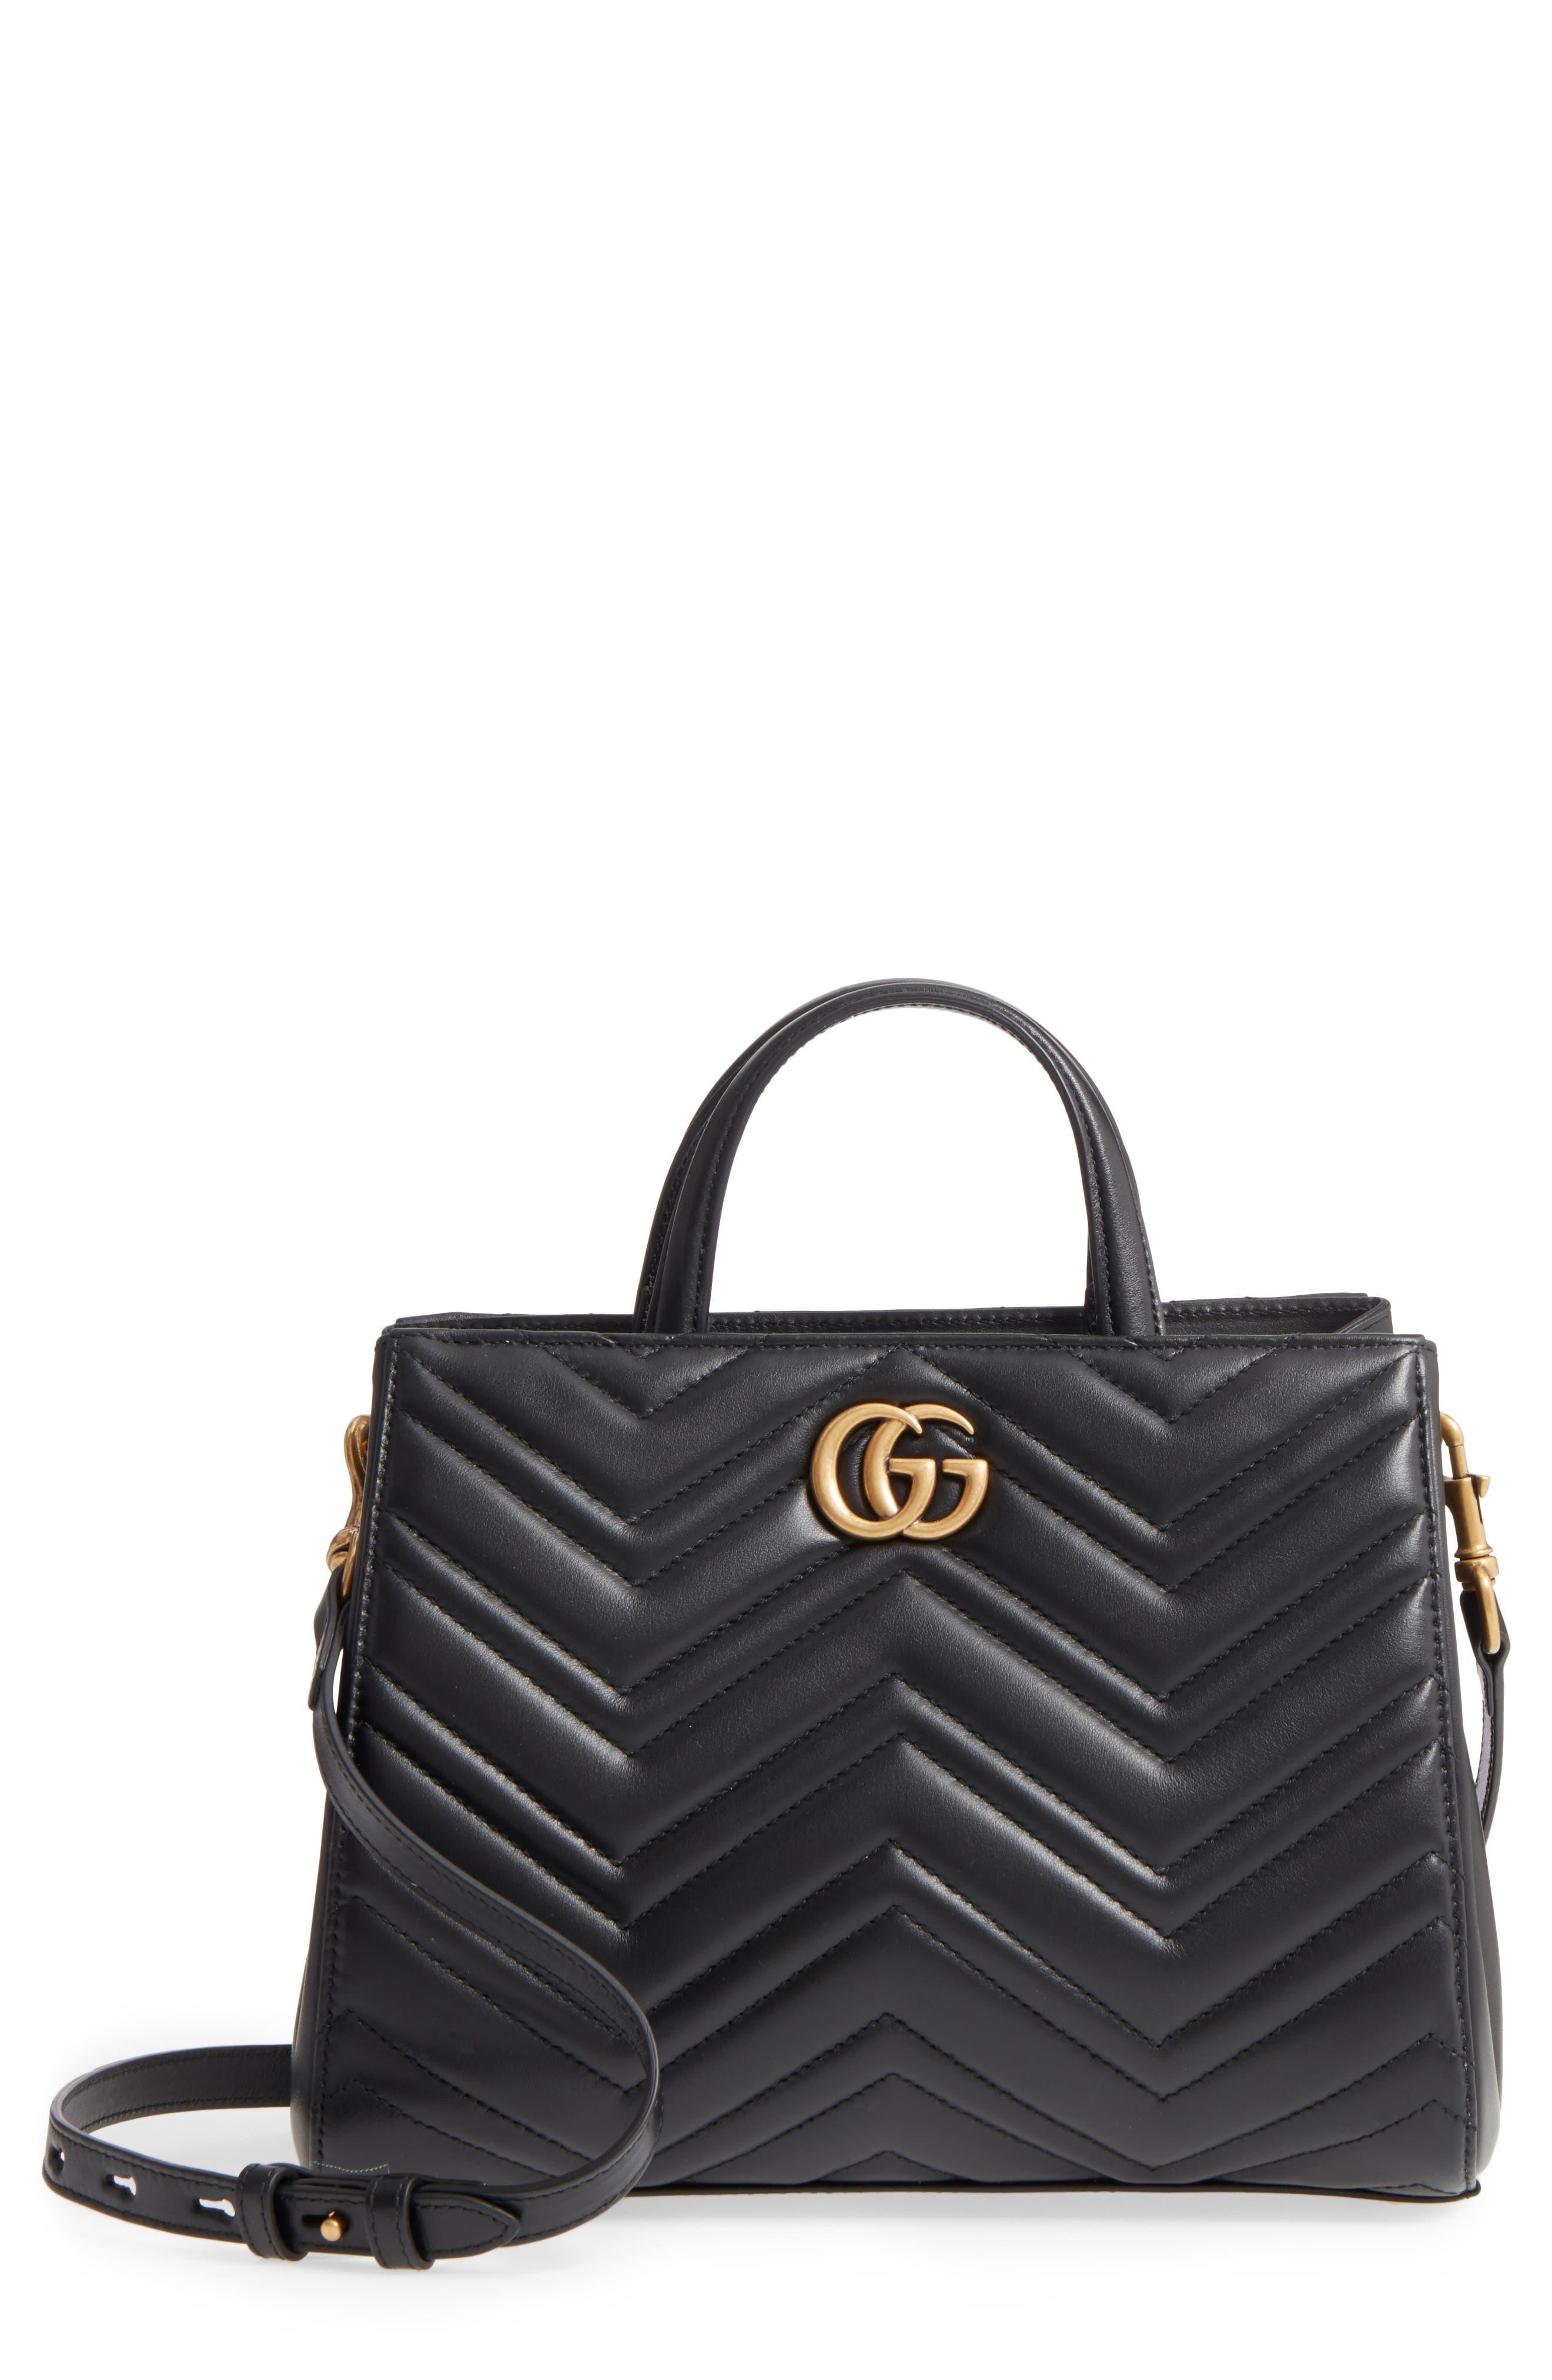 GG Small Marmont 2.0 Matelassé Leather Top Handle Satchel,                             Main thumbnail 1, color,                             Nero/ Nero